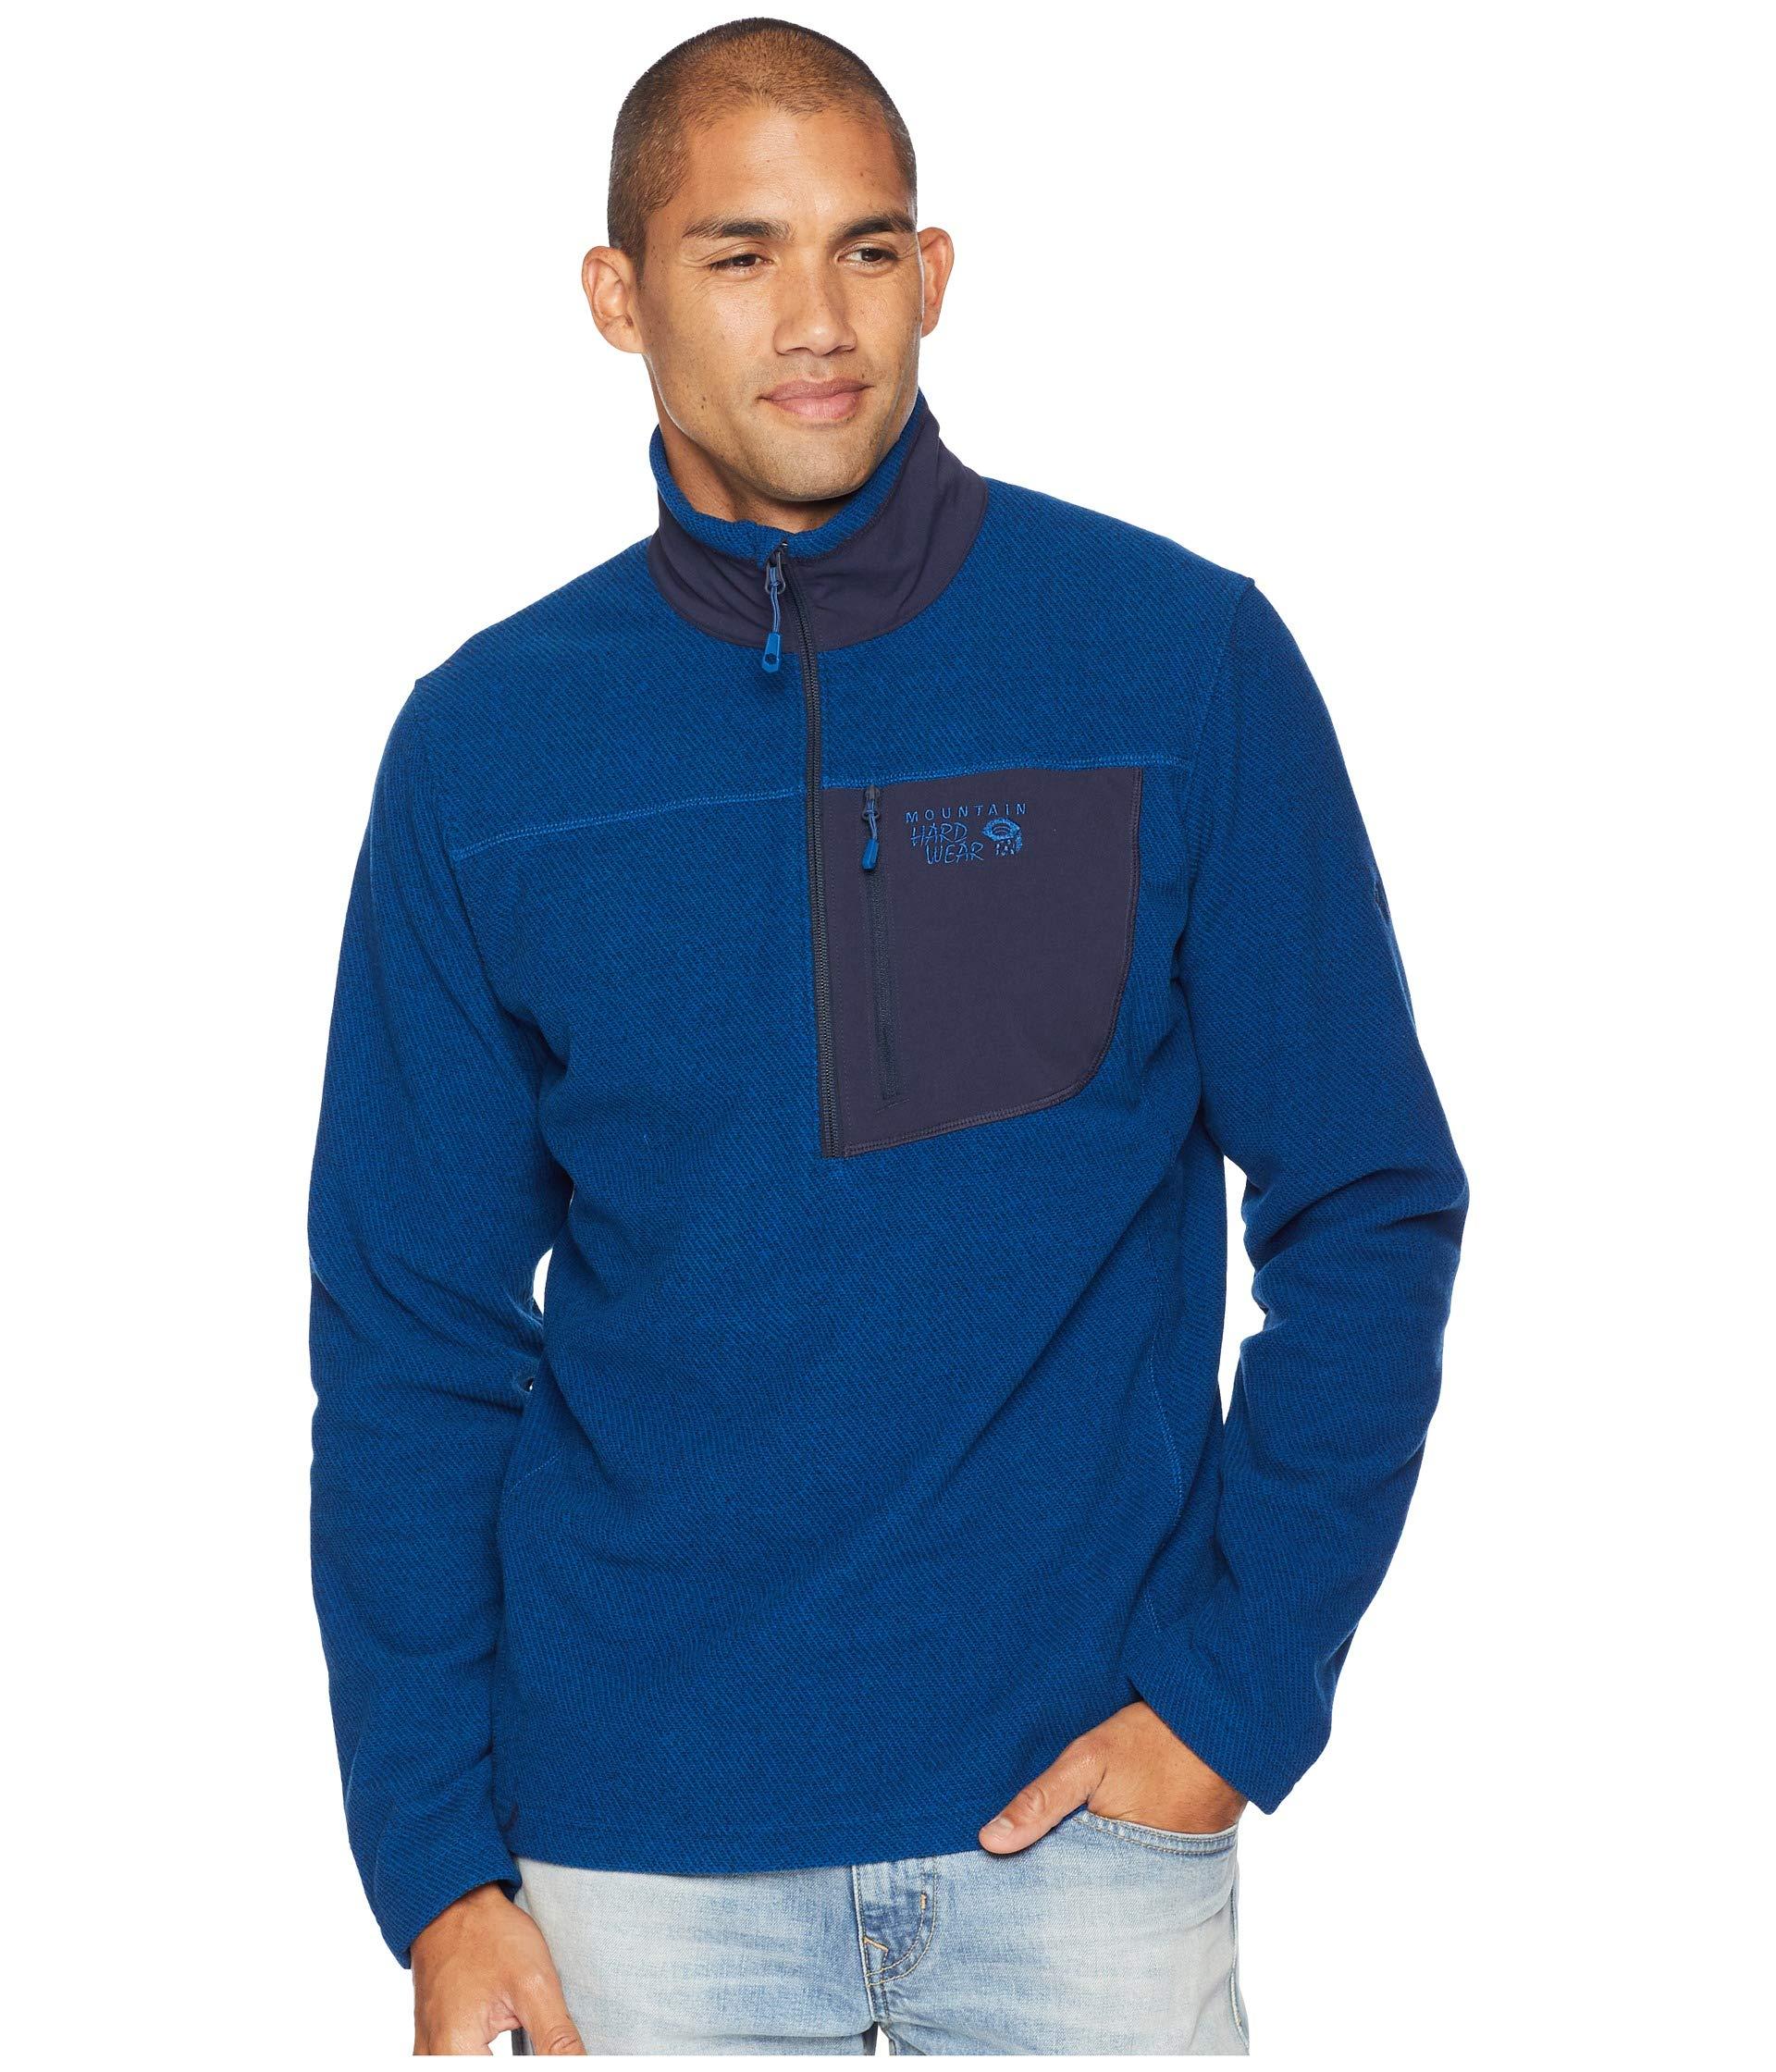 Blue 1 2 Zip Fleece Twill Mountain Nightfall Toasty Hardwear xqwBSCv8